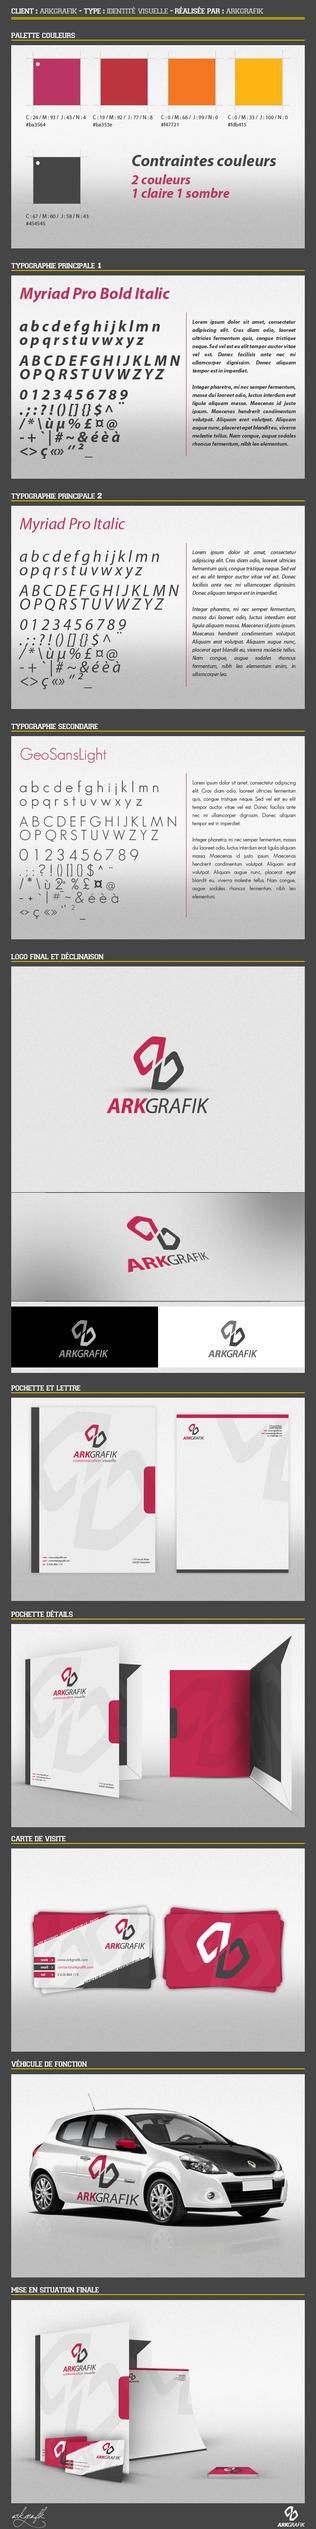 ARKGRAFIK Complete Identity by arkgrafik